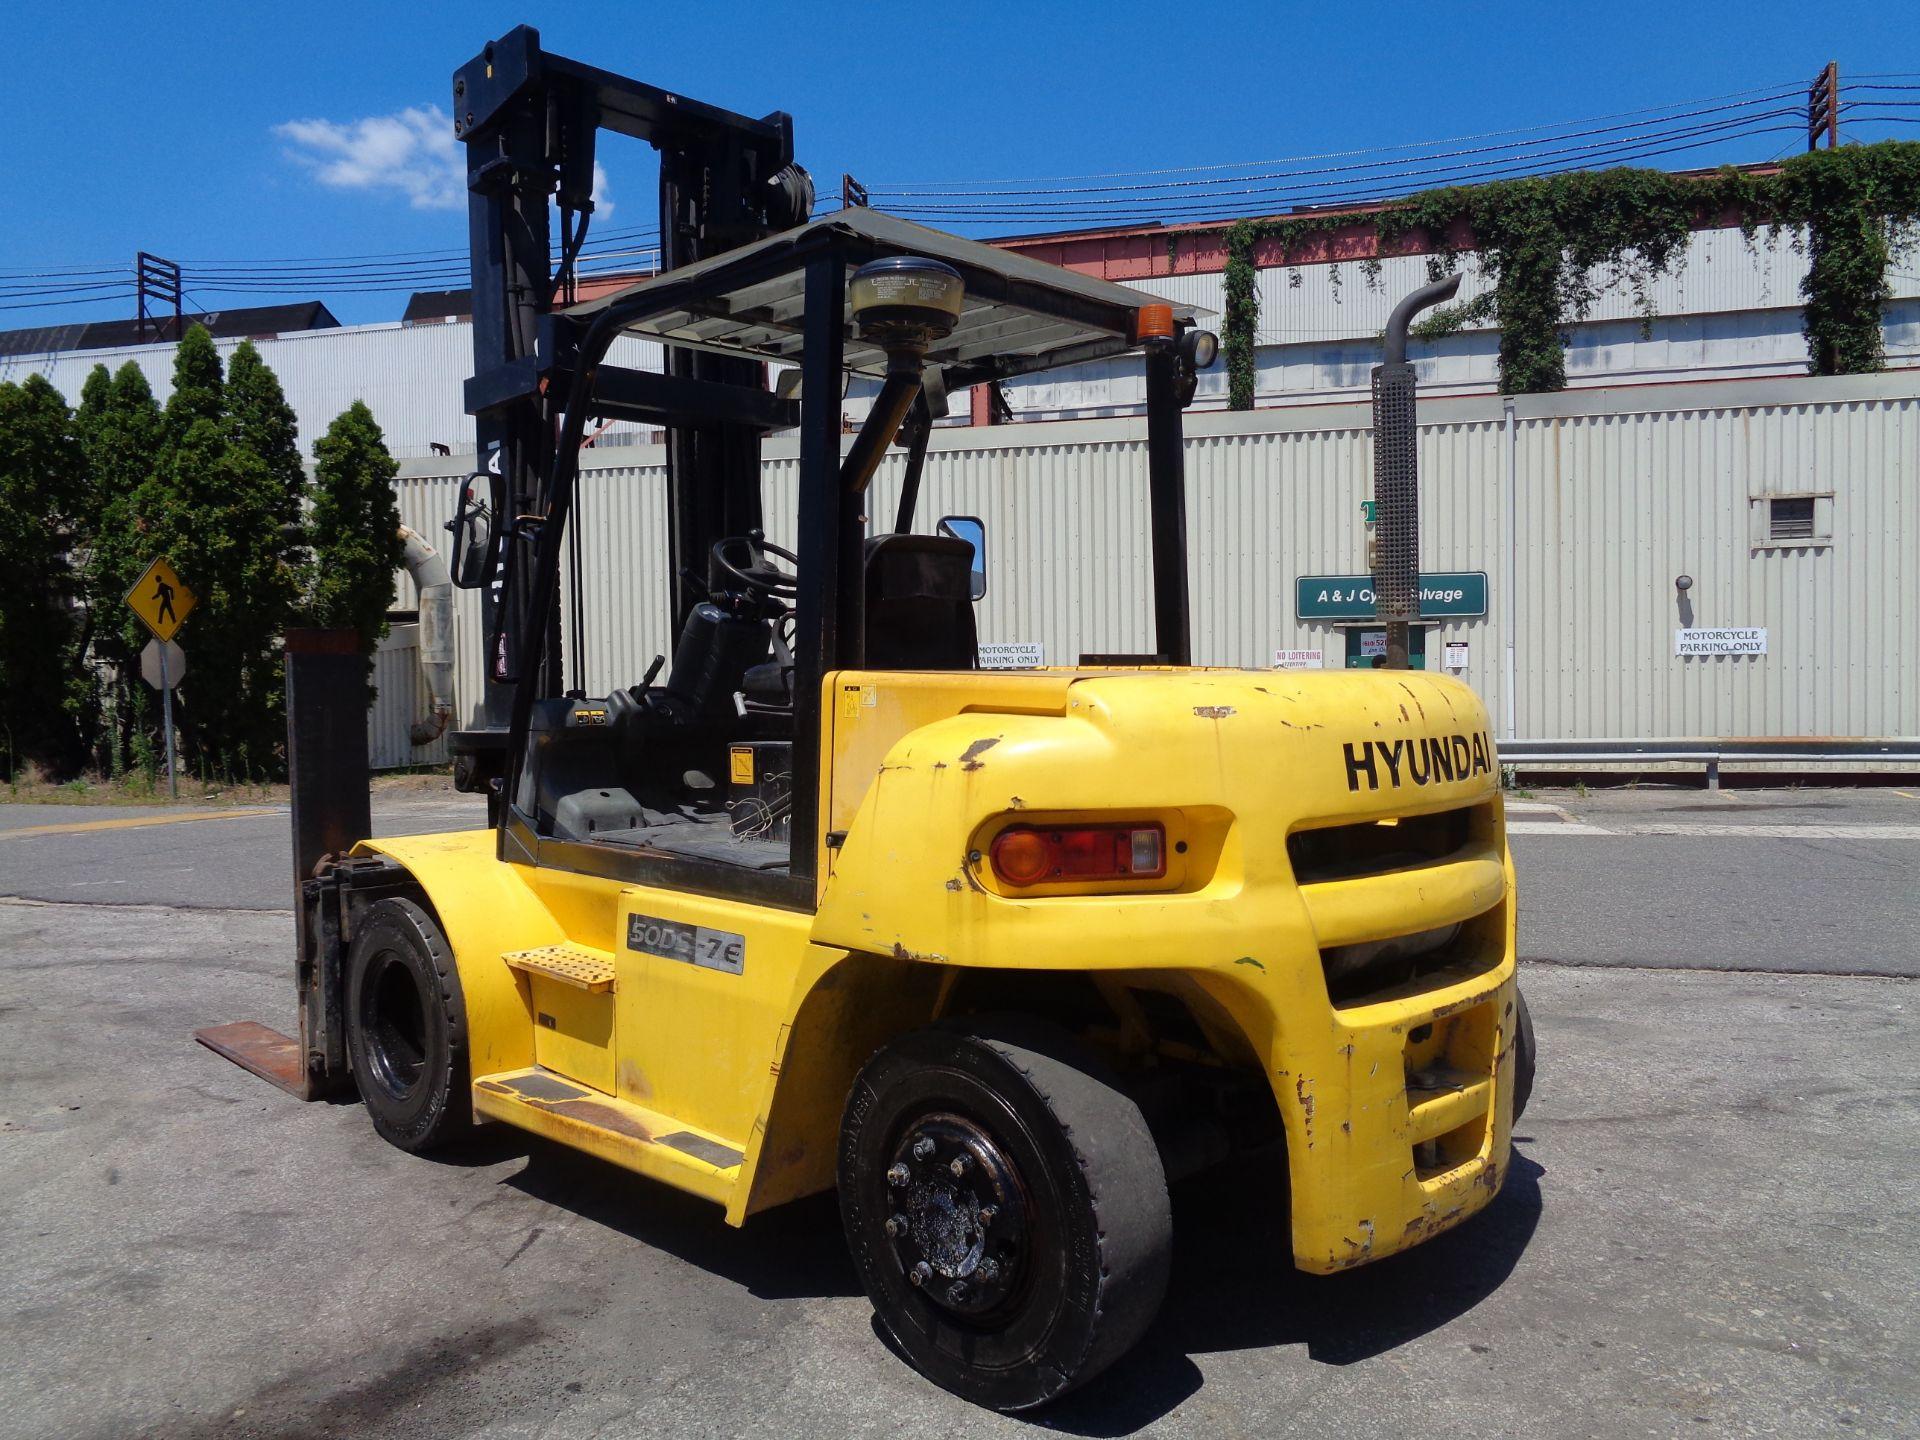 Lot 26 - 2014 Hyundai 50DS7E 11,000lb Forklift